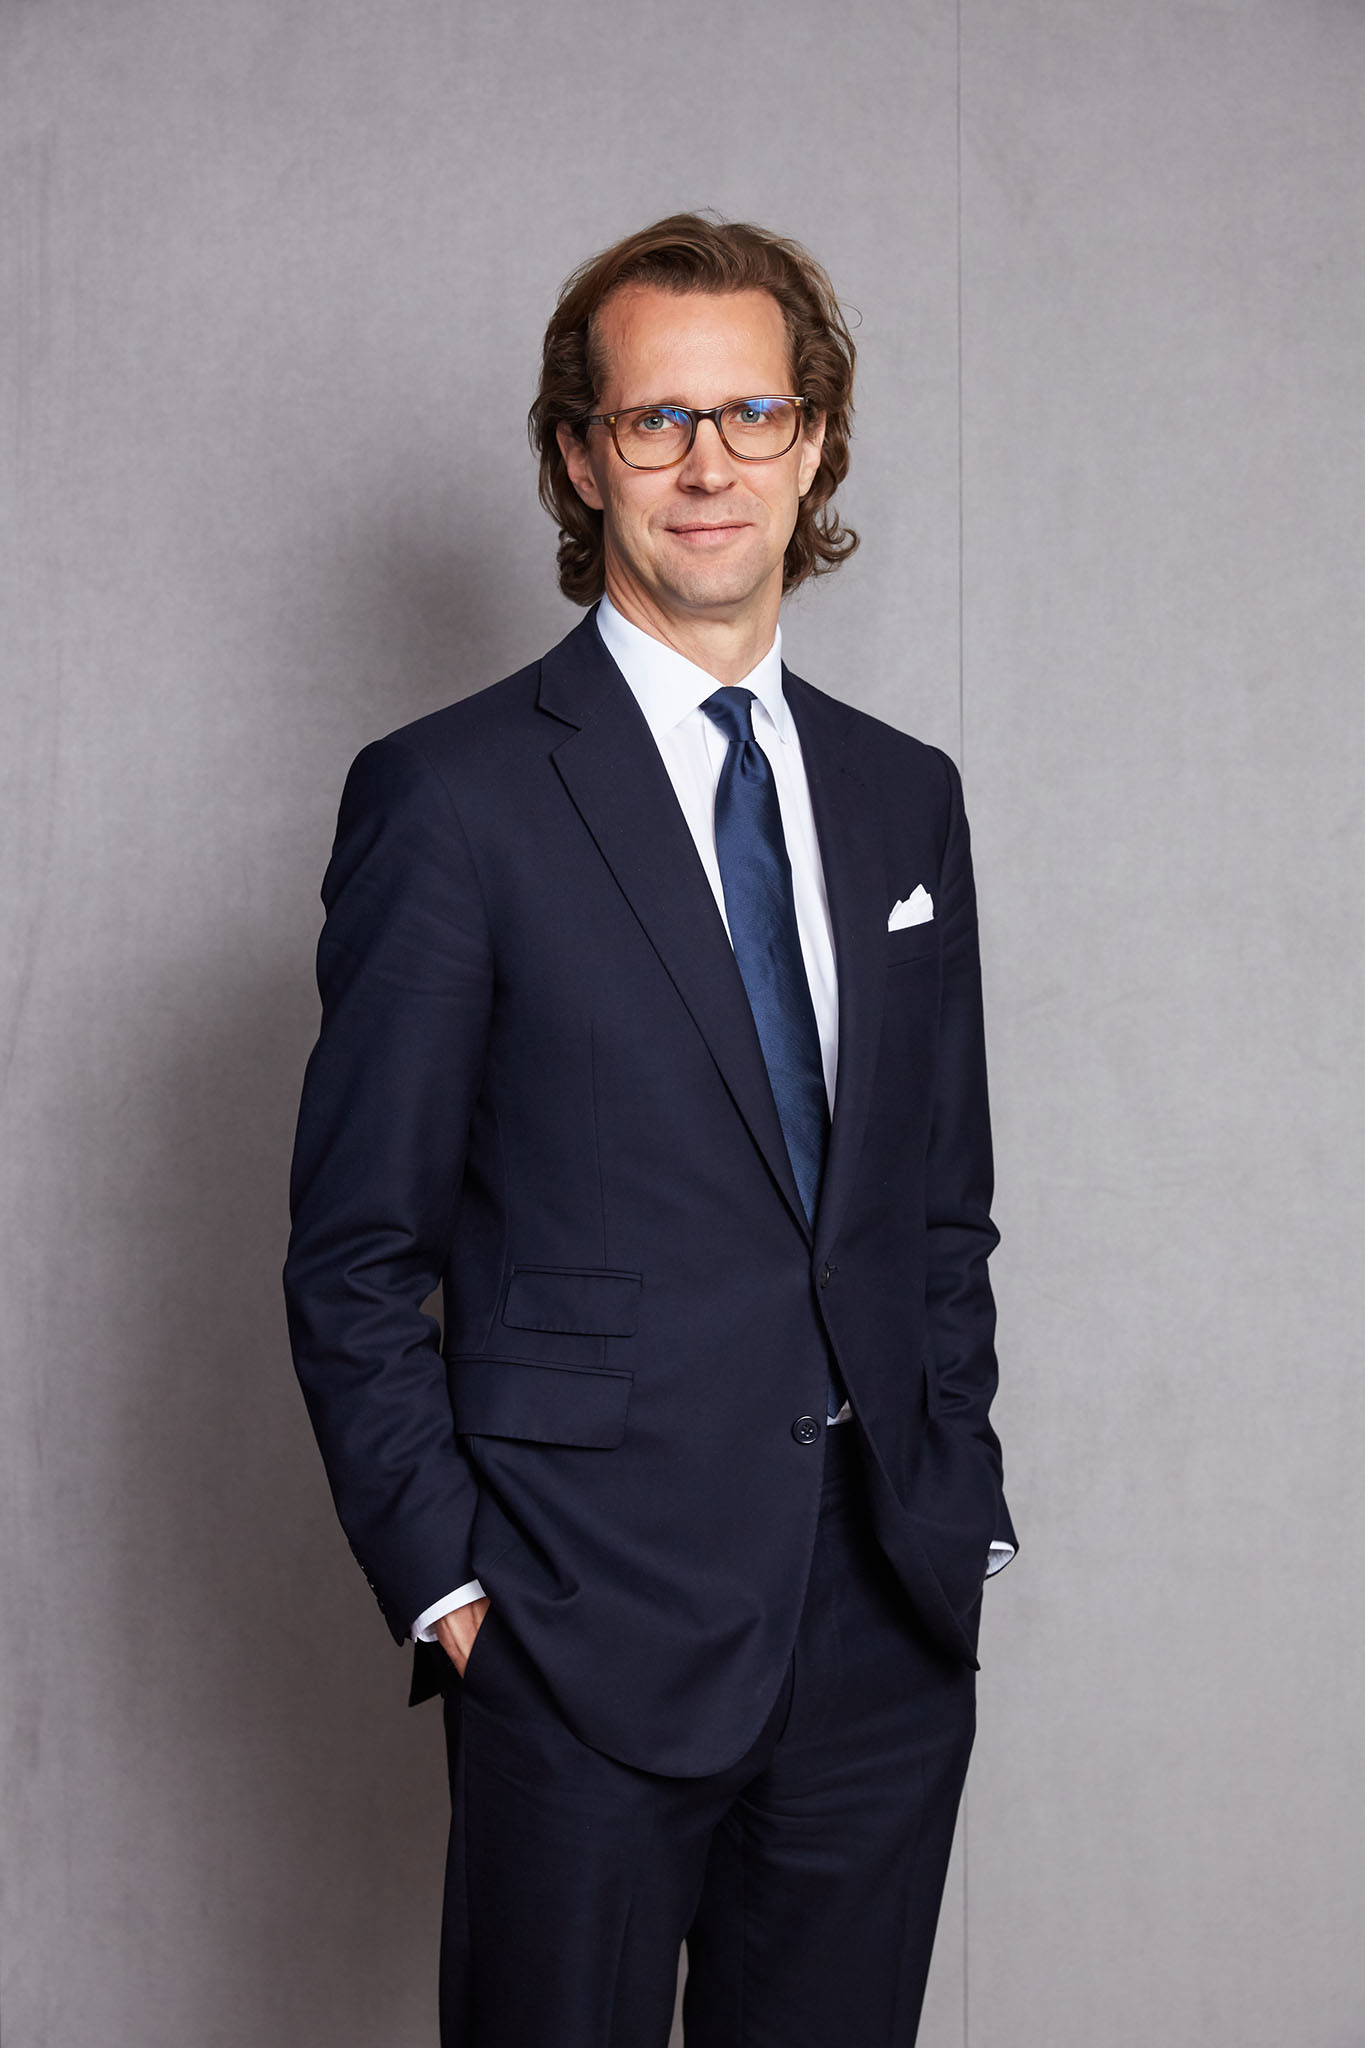 Stefan Larsson of PVH